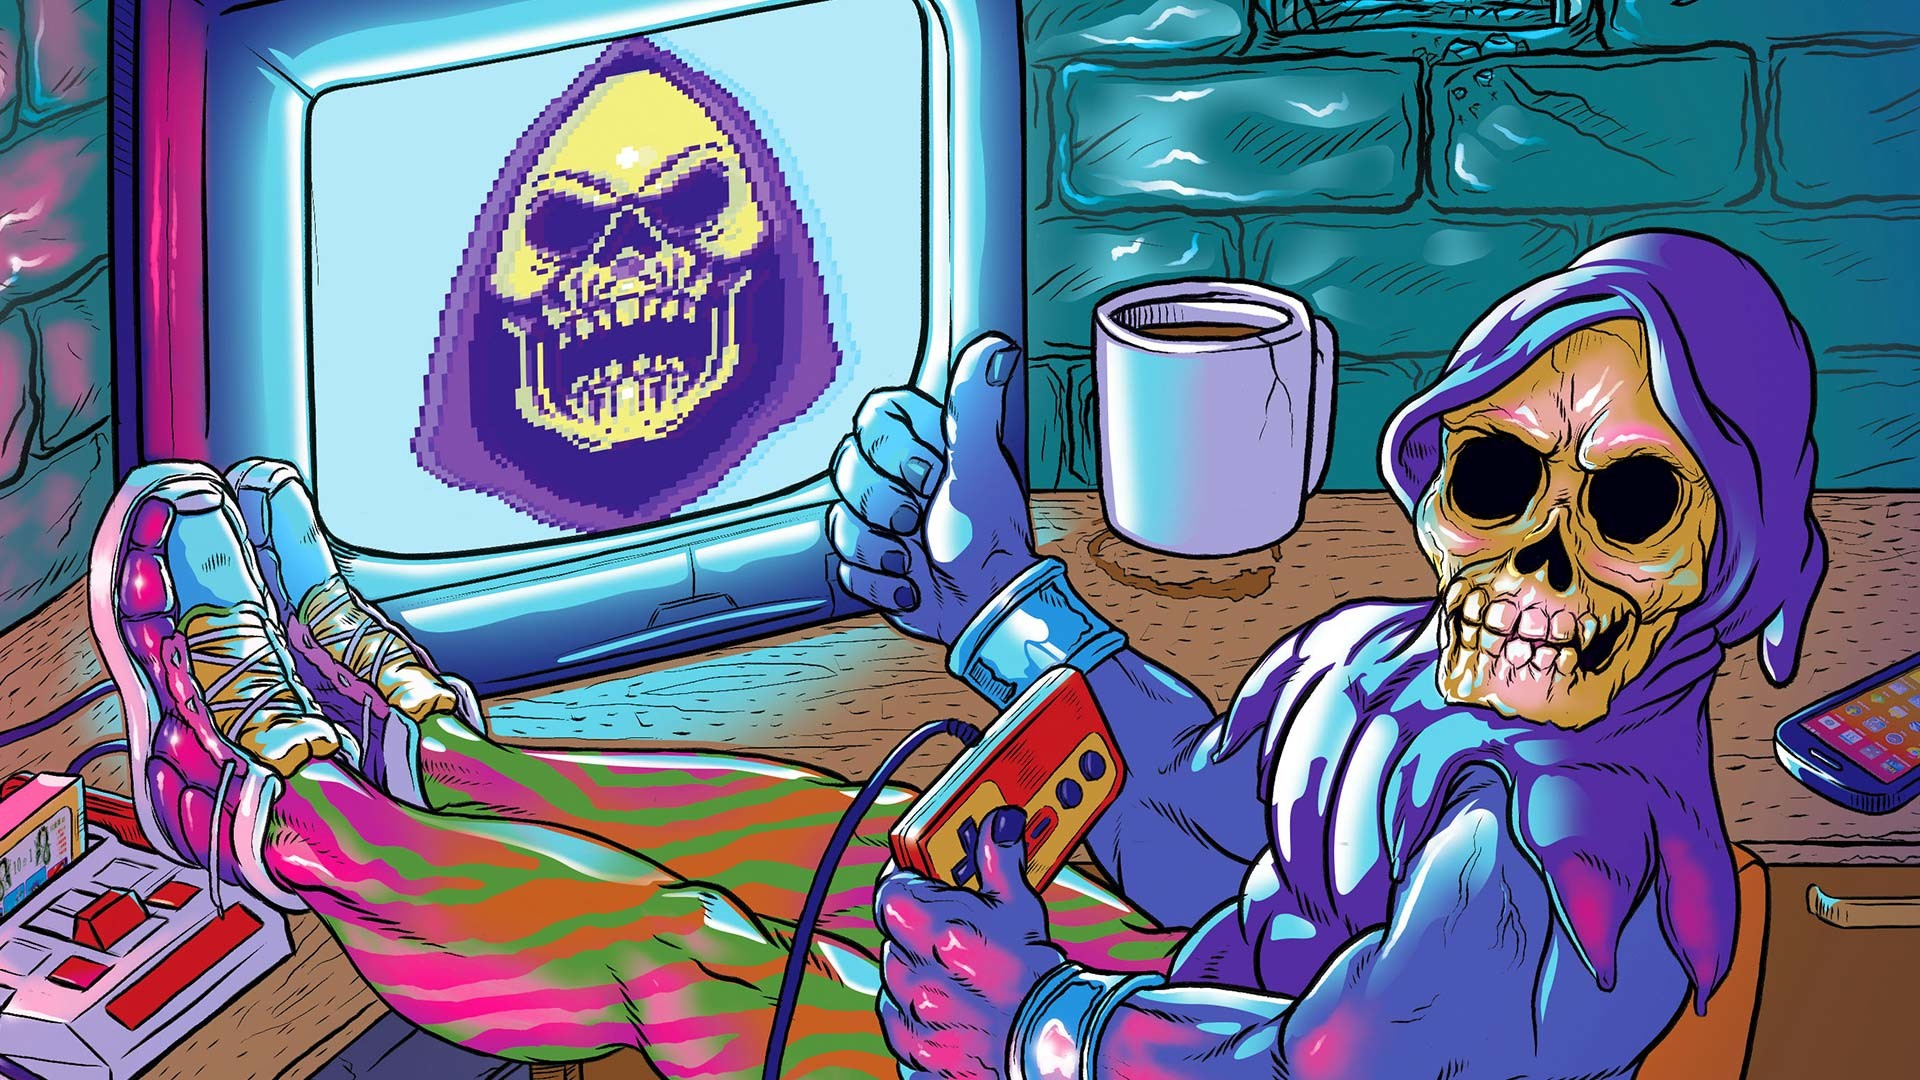 … Indie-Toys-Espacio-Cabrera-Skeletor-He-Man-80s -Retro-Pop-Culture-Family-Game-Famicom-Pixelart-Cartoon-Cool-Illustration-Comic-Digital-Artist-Artwork-  …